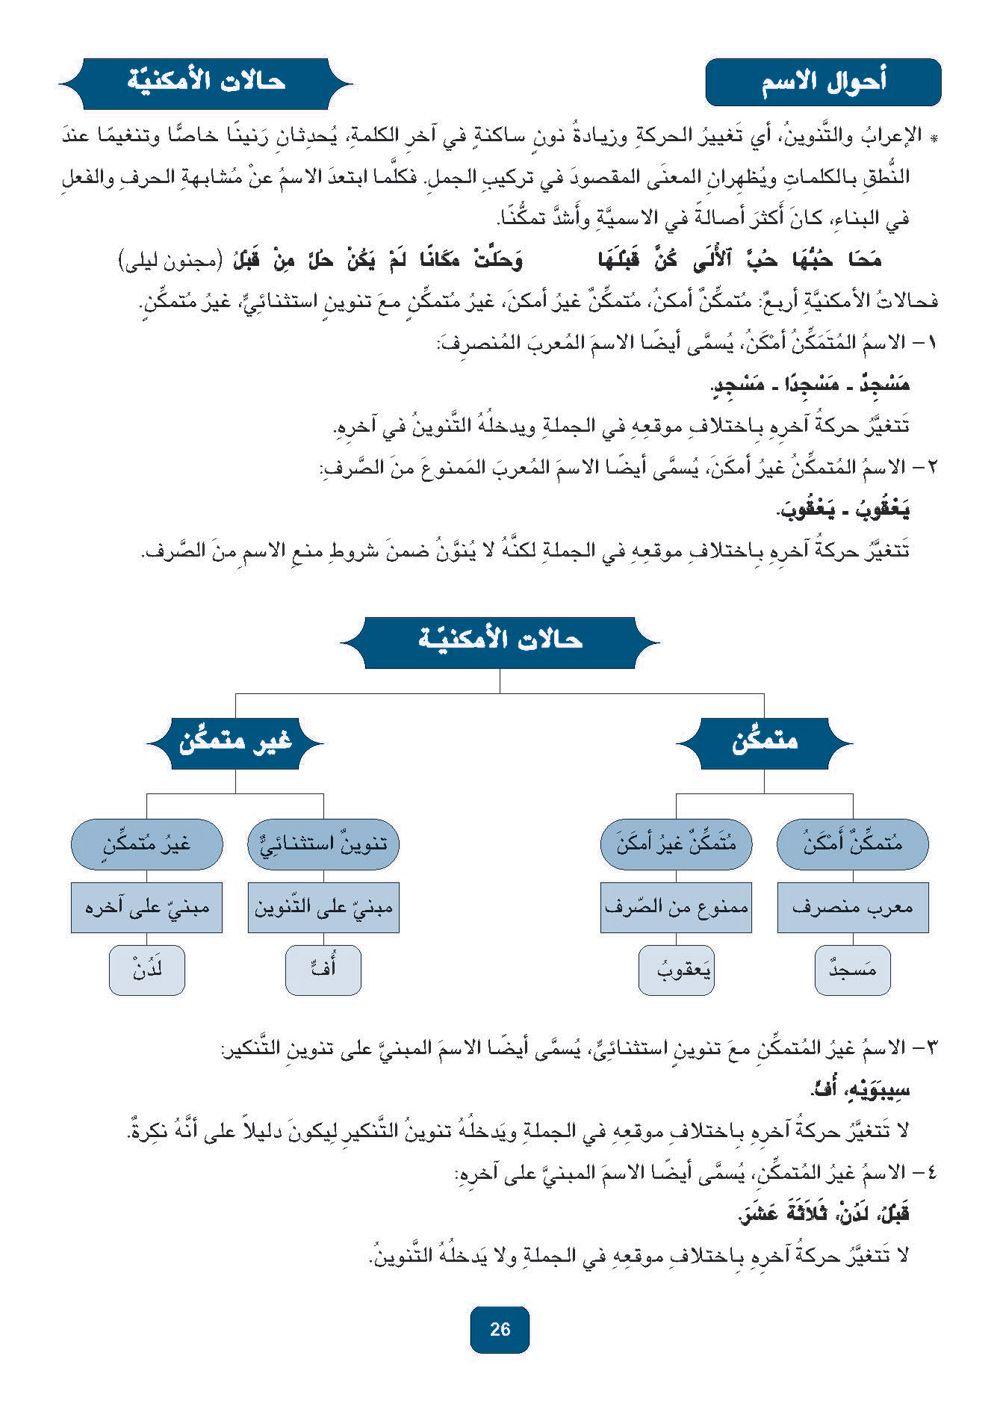 26 Jpg 1000 1412 Learning Arabic Learn Arabic Online Arabic Language